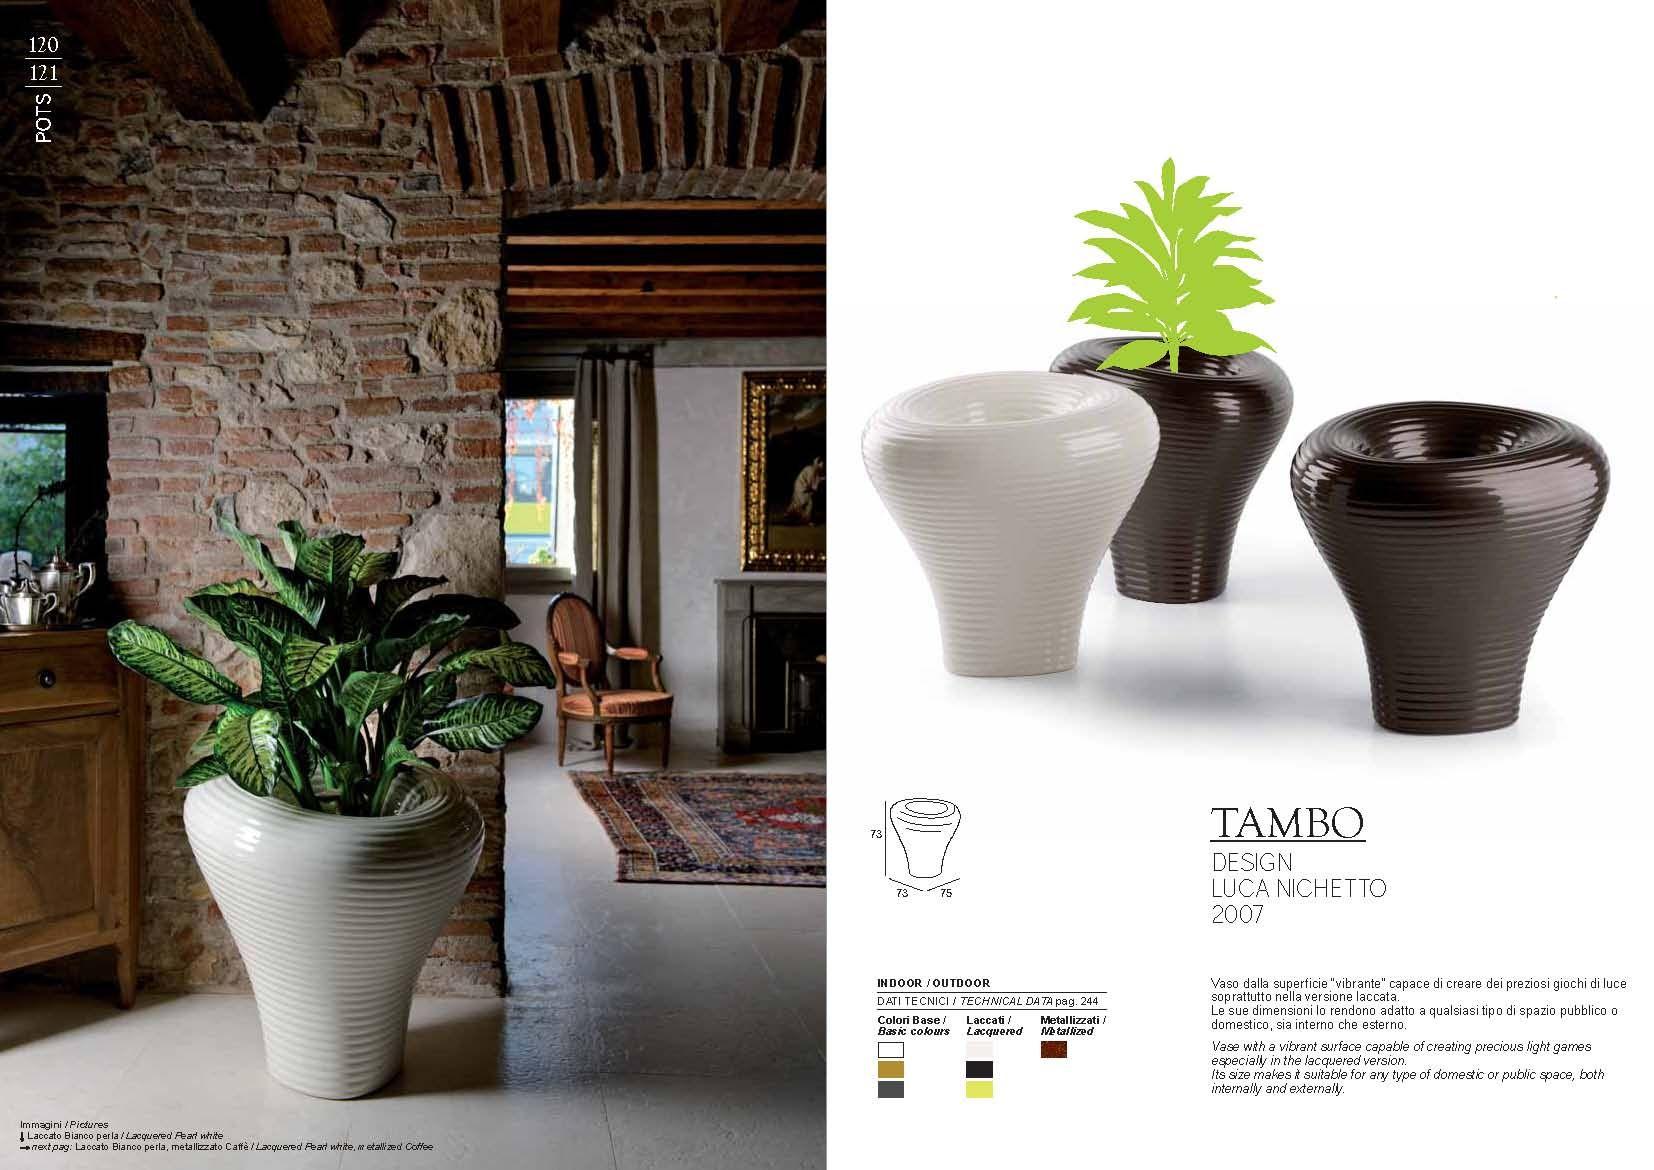 gartenm bel pot plust collection serie tambodie m bel aus italien. Black Bedroom Furniture Sets. Home Design Ideas